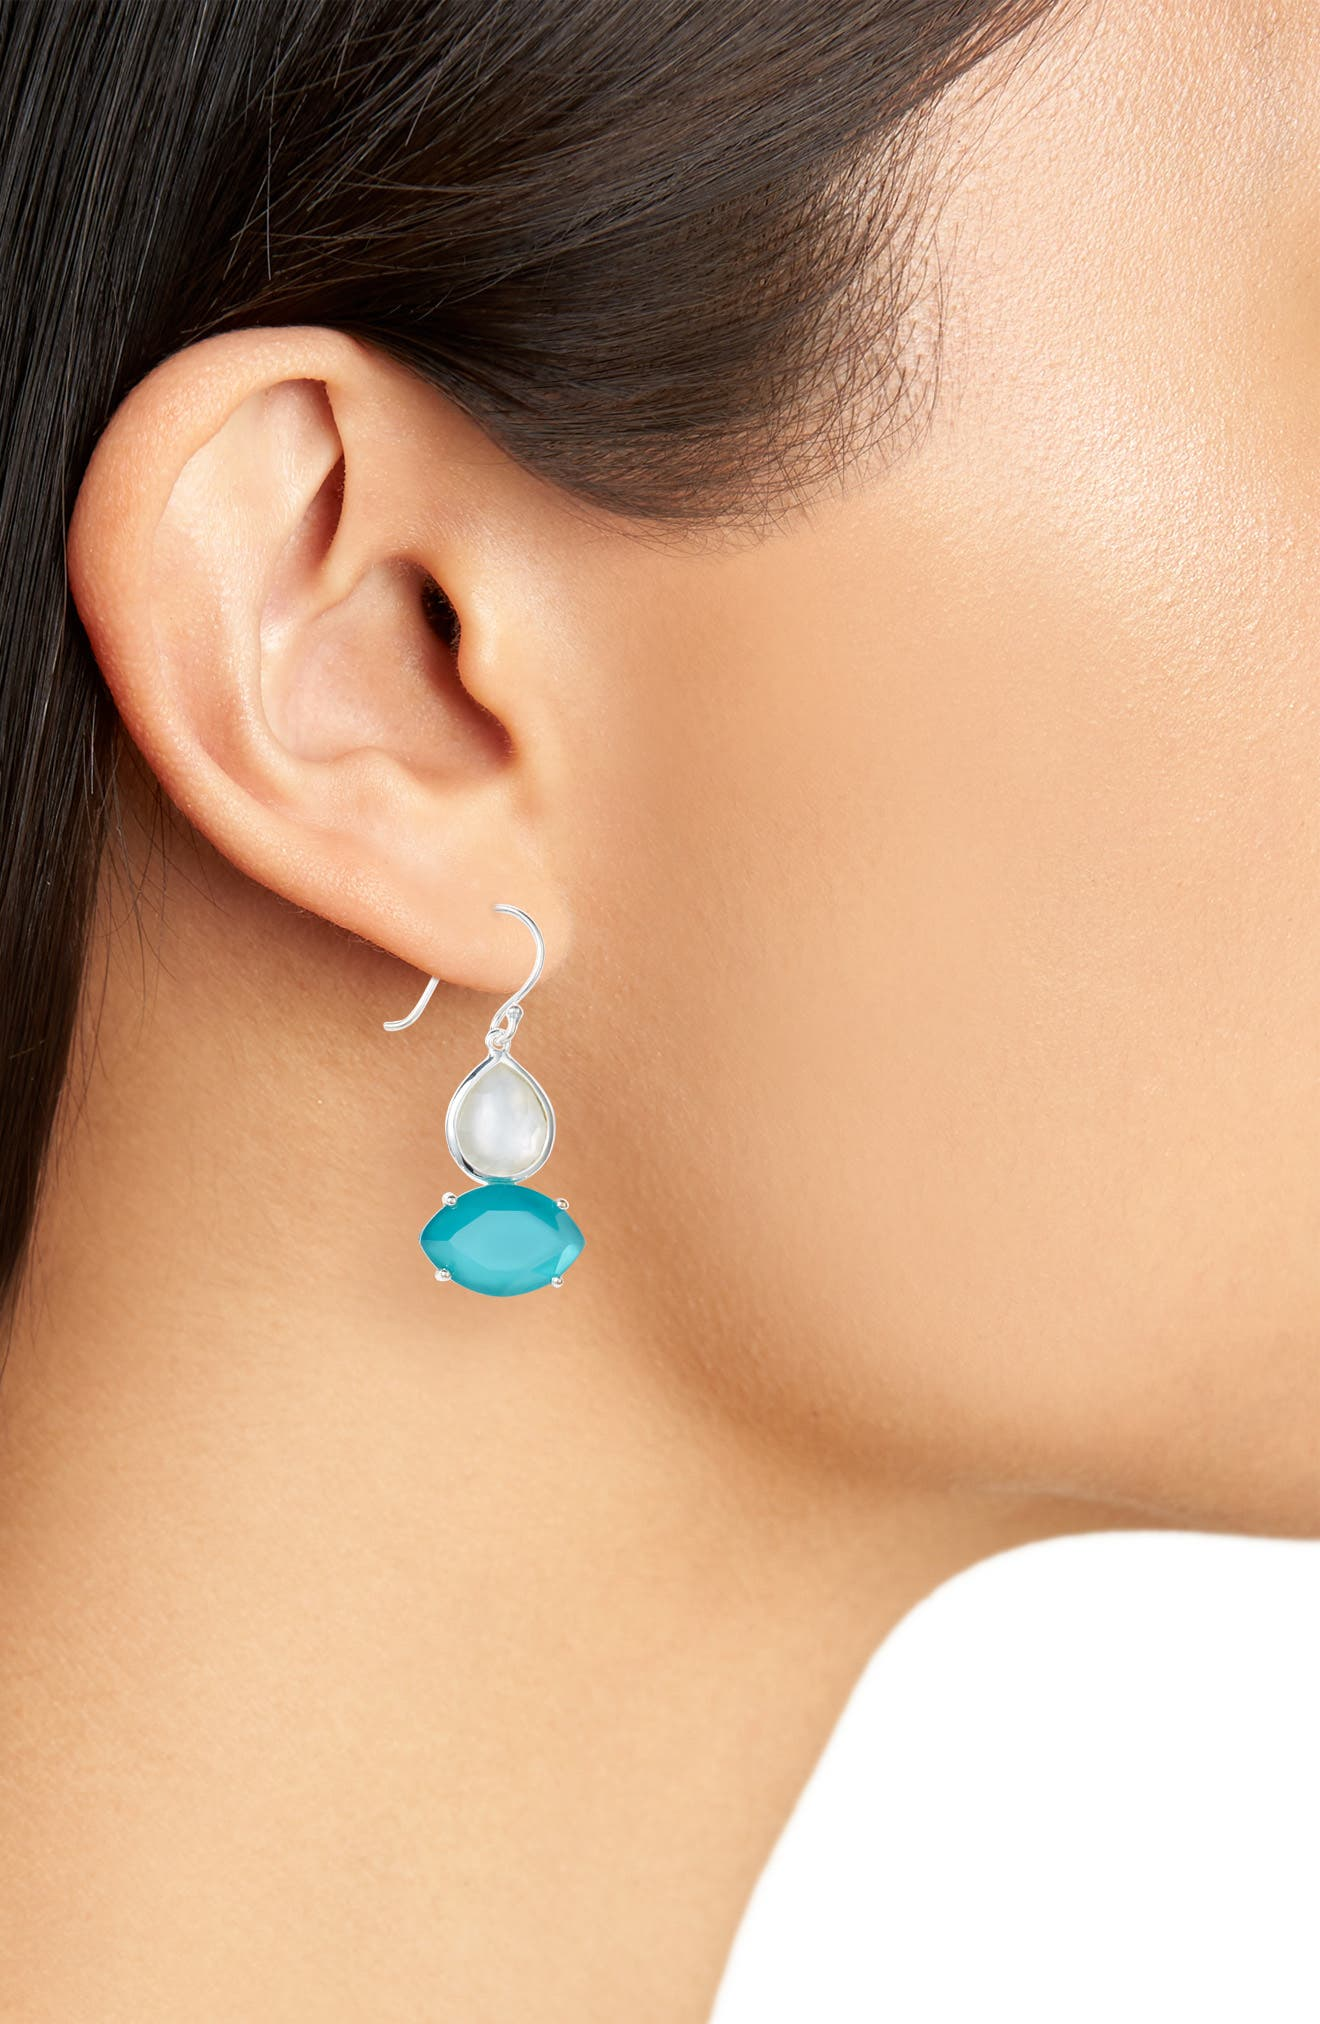 Wonderland 2-Stone Drop Earrings,                             Alternate thumbnail 2, color,                             BLUE/ MOP